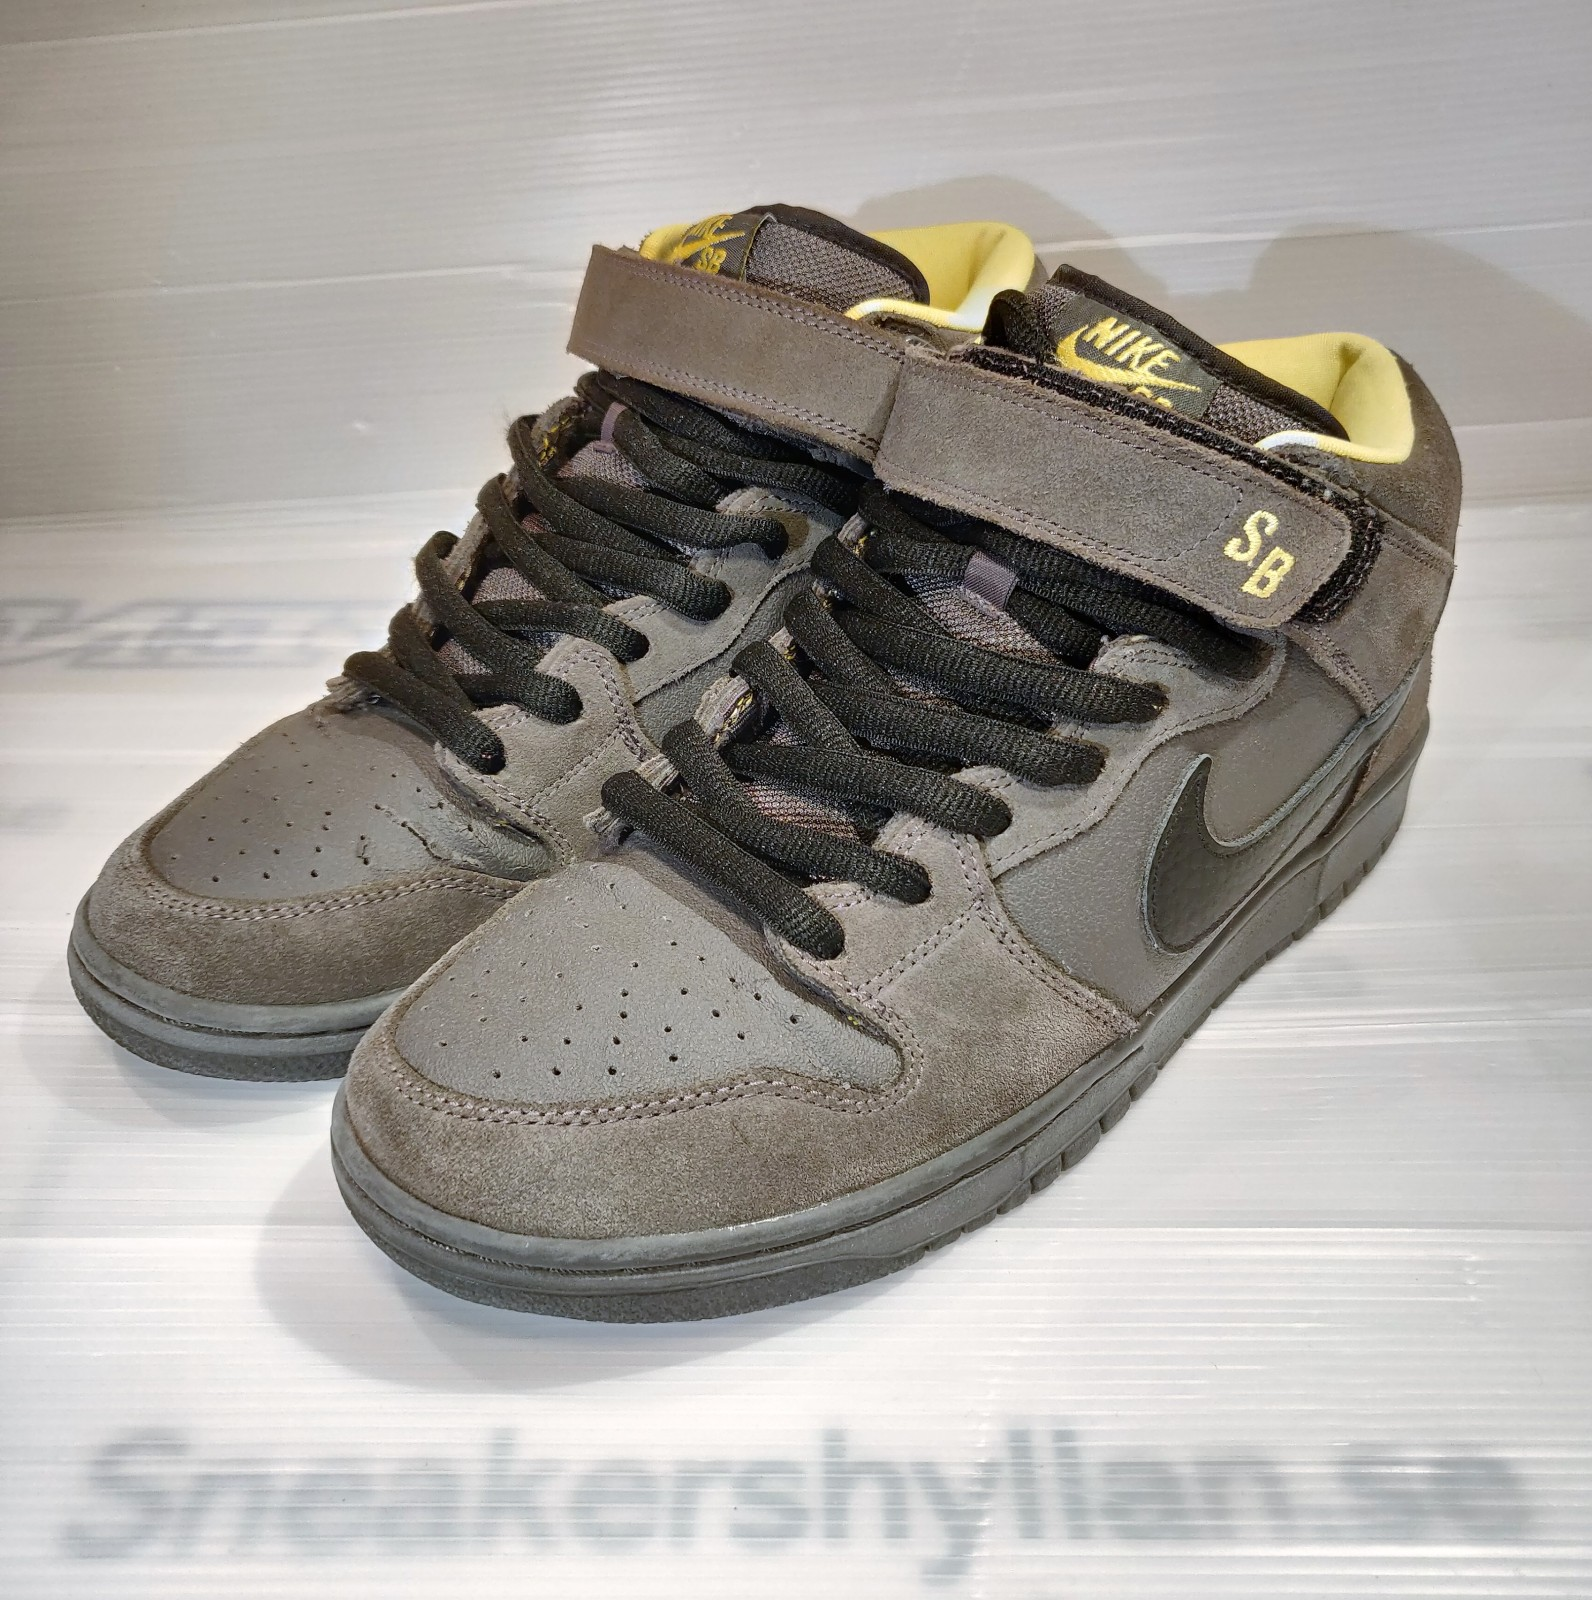 399fbbc3560b Nike SB Dunk Mid PRO Batman - Sneakershyllan GBG AB